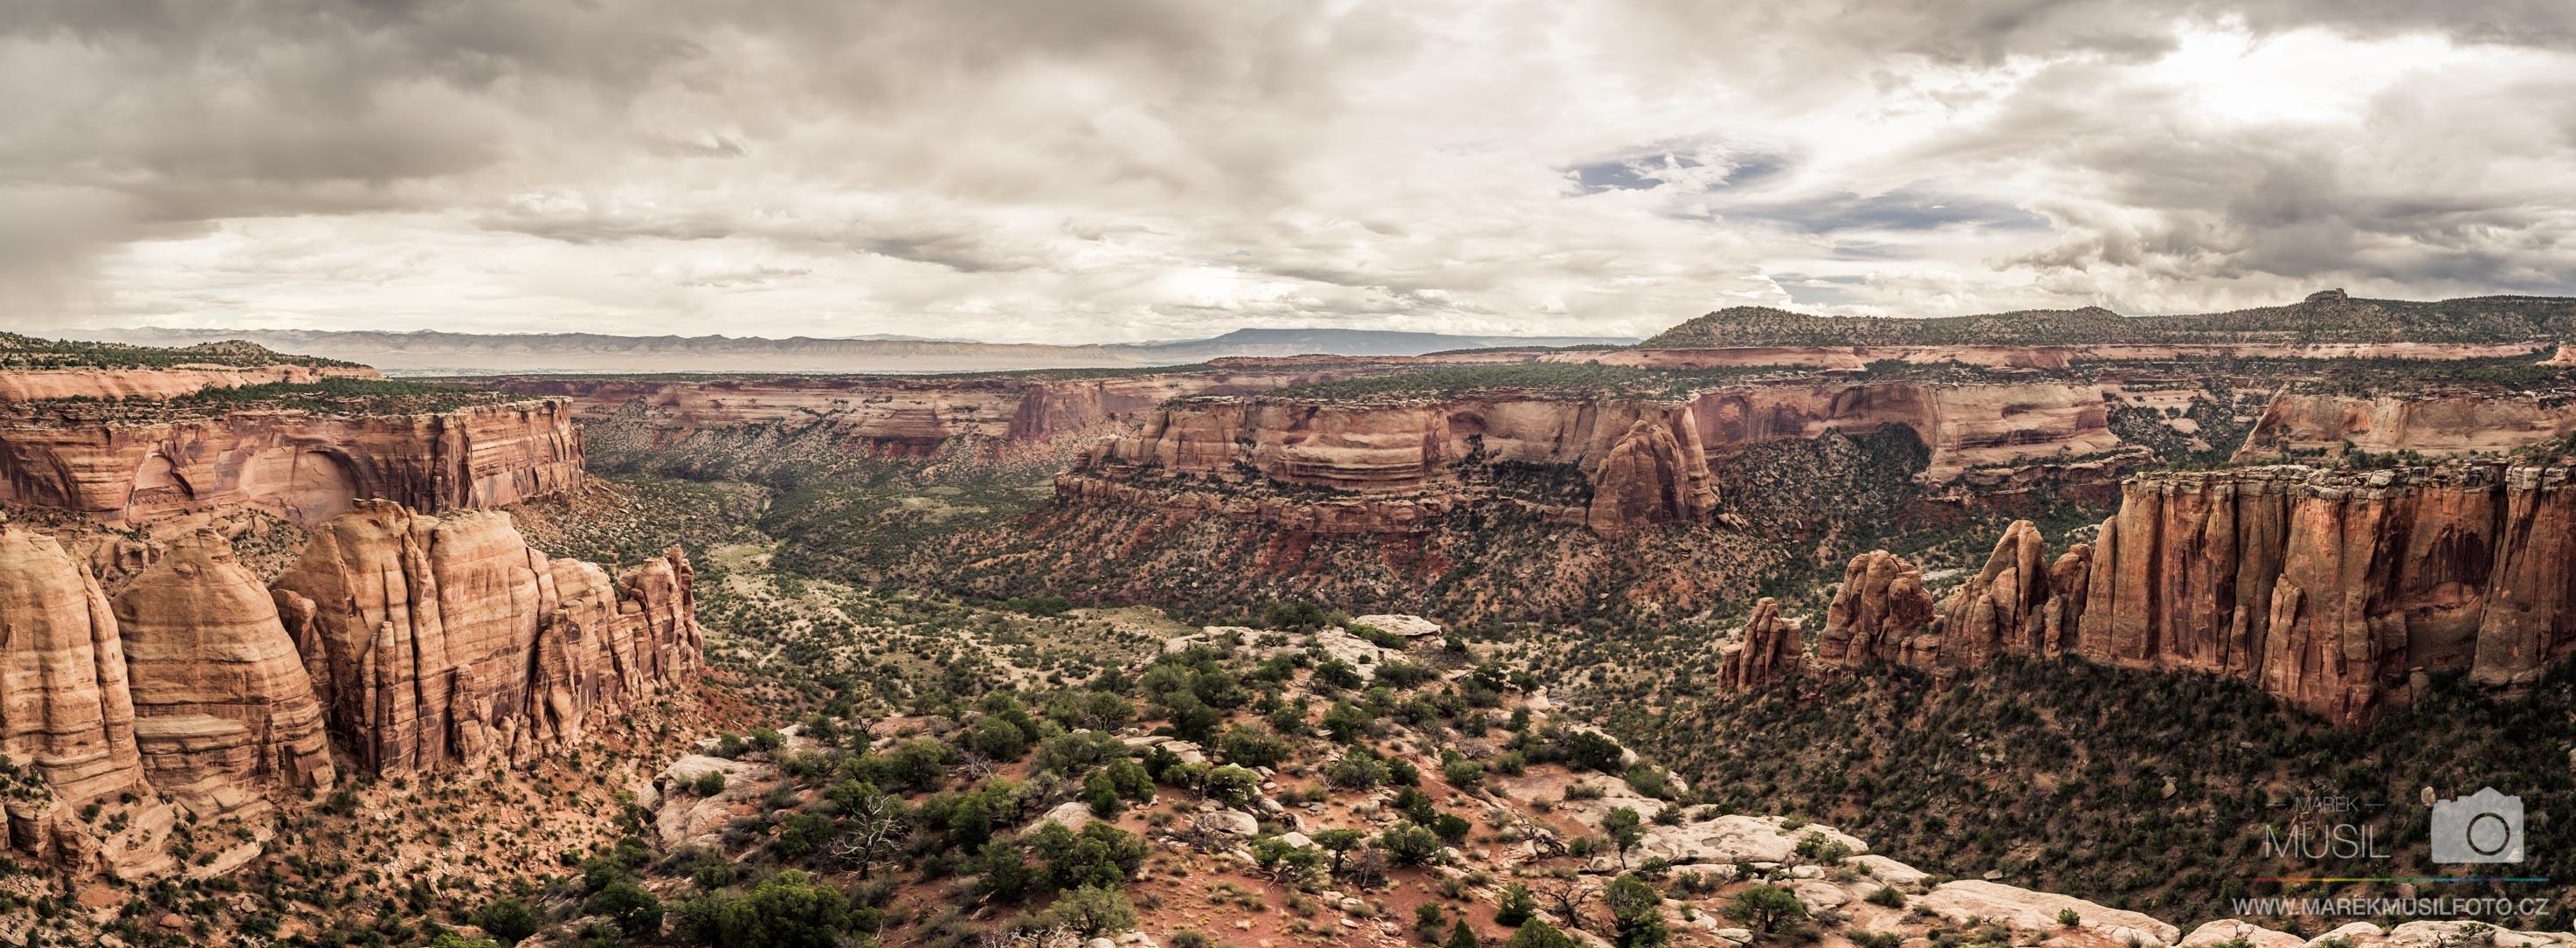 Highland View Colorado National Monument